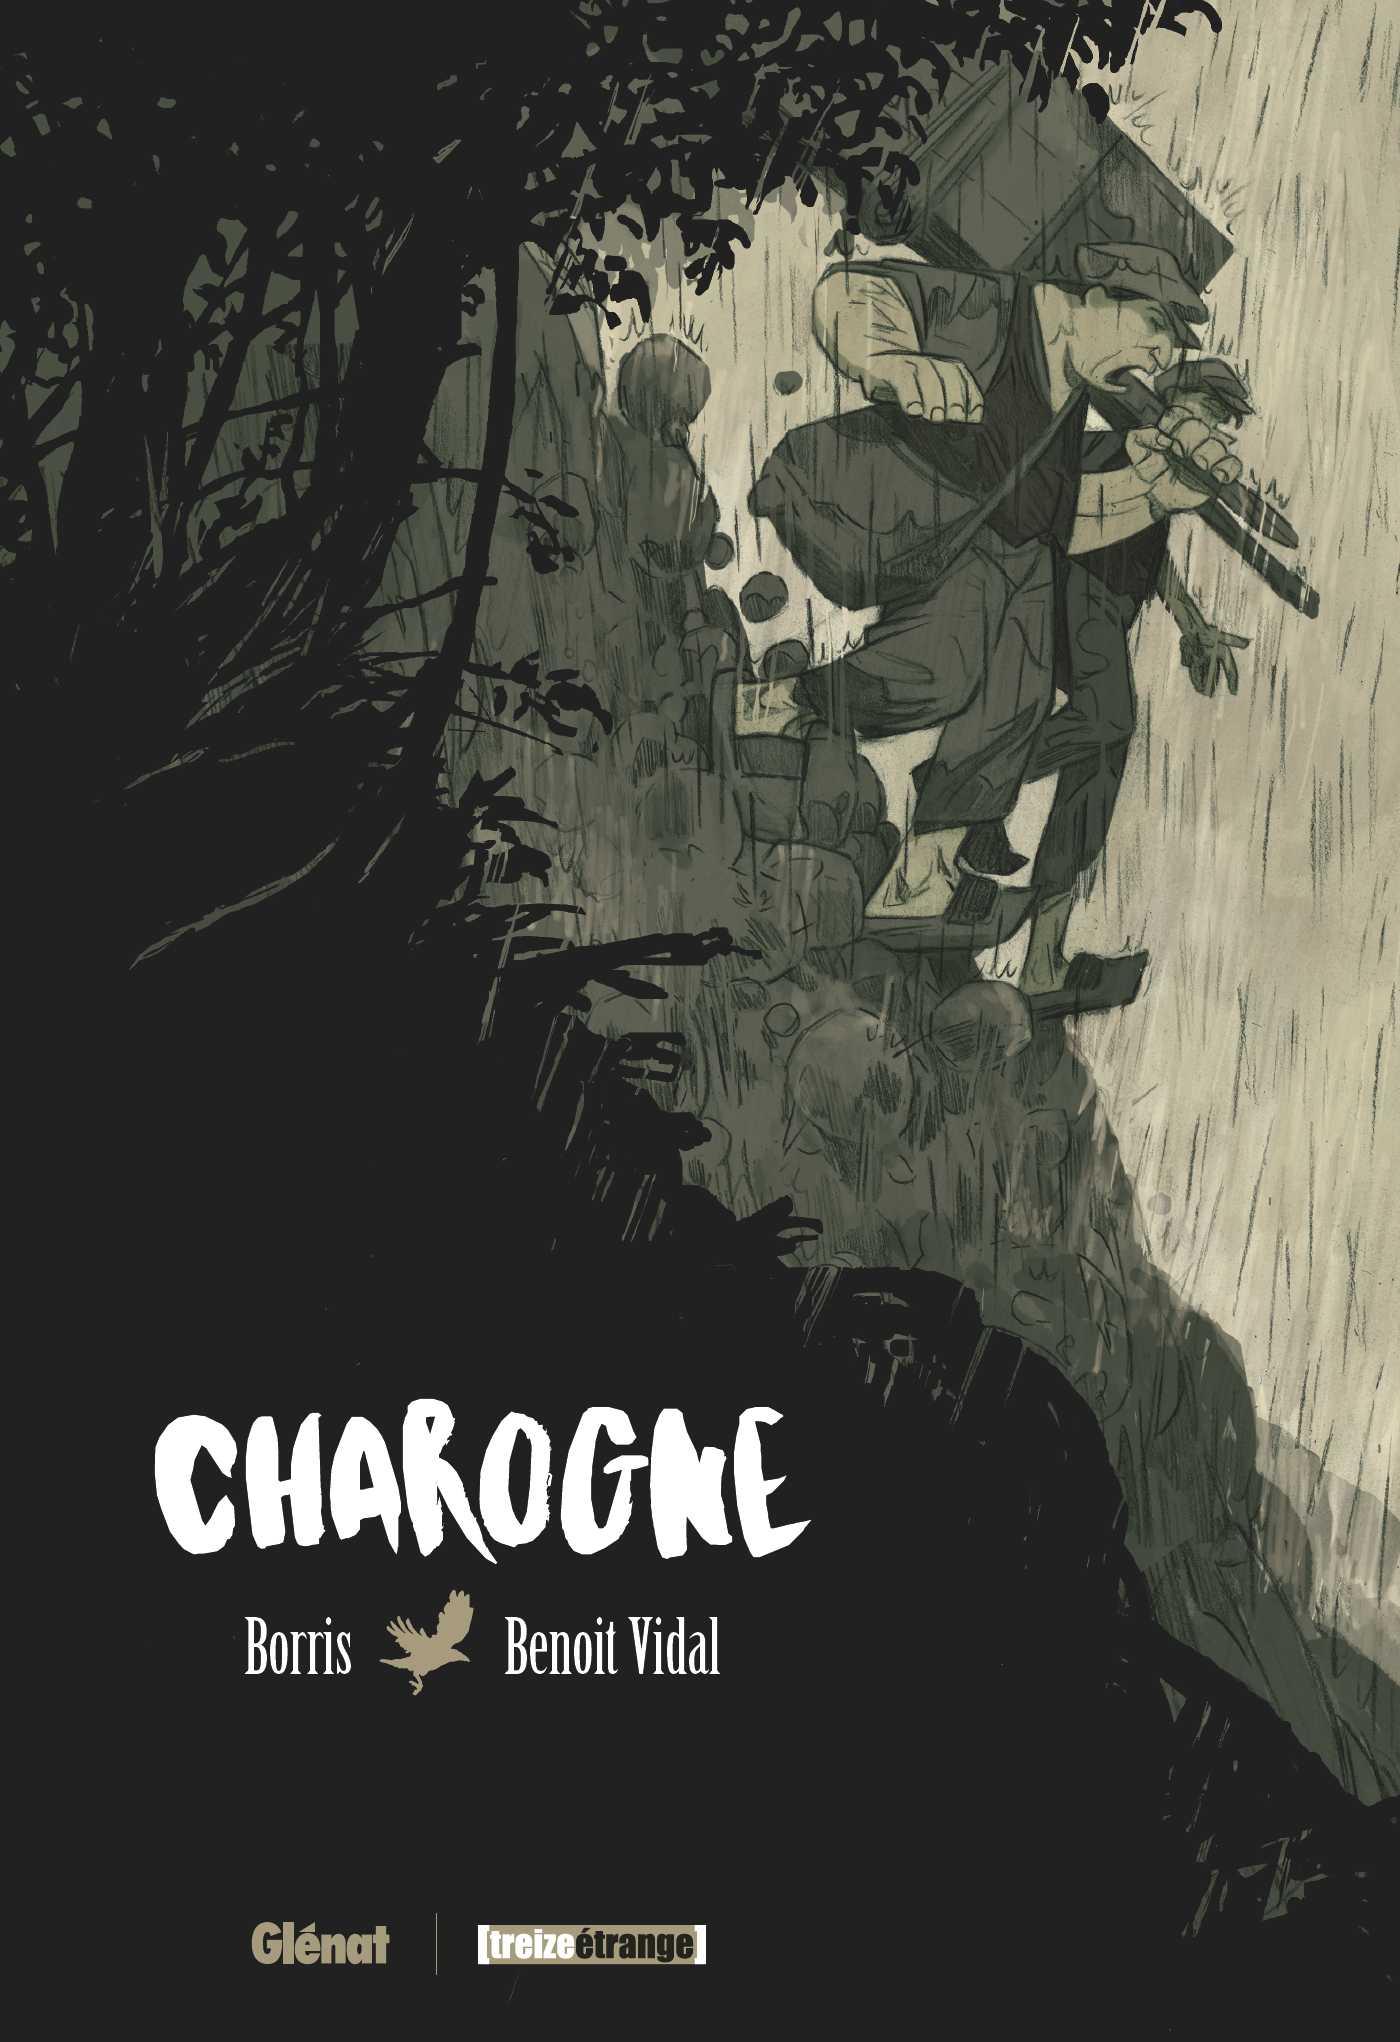 Charogne, fantasia chez les ploucs